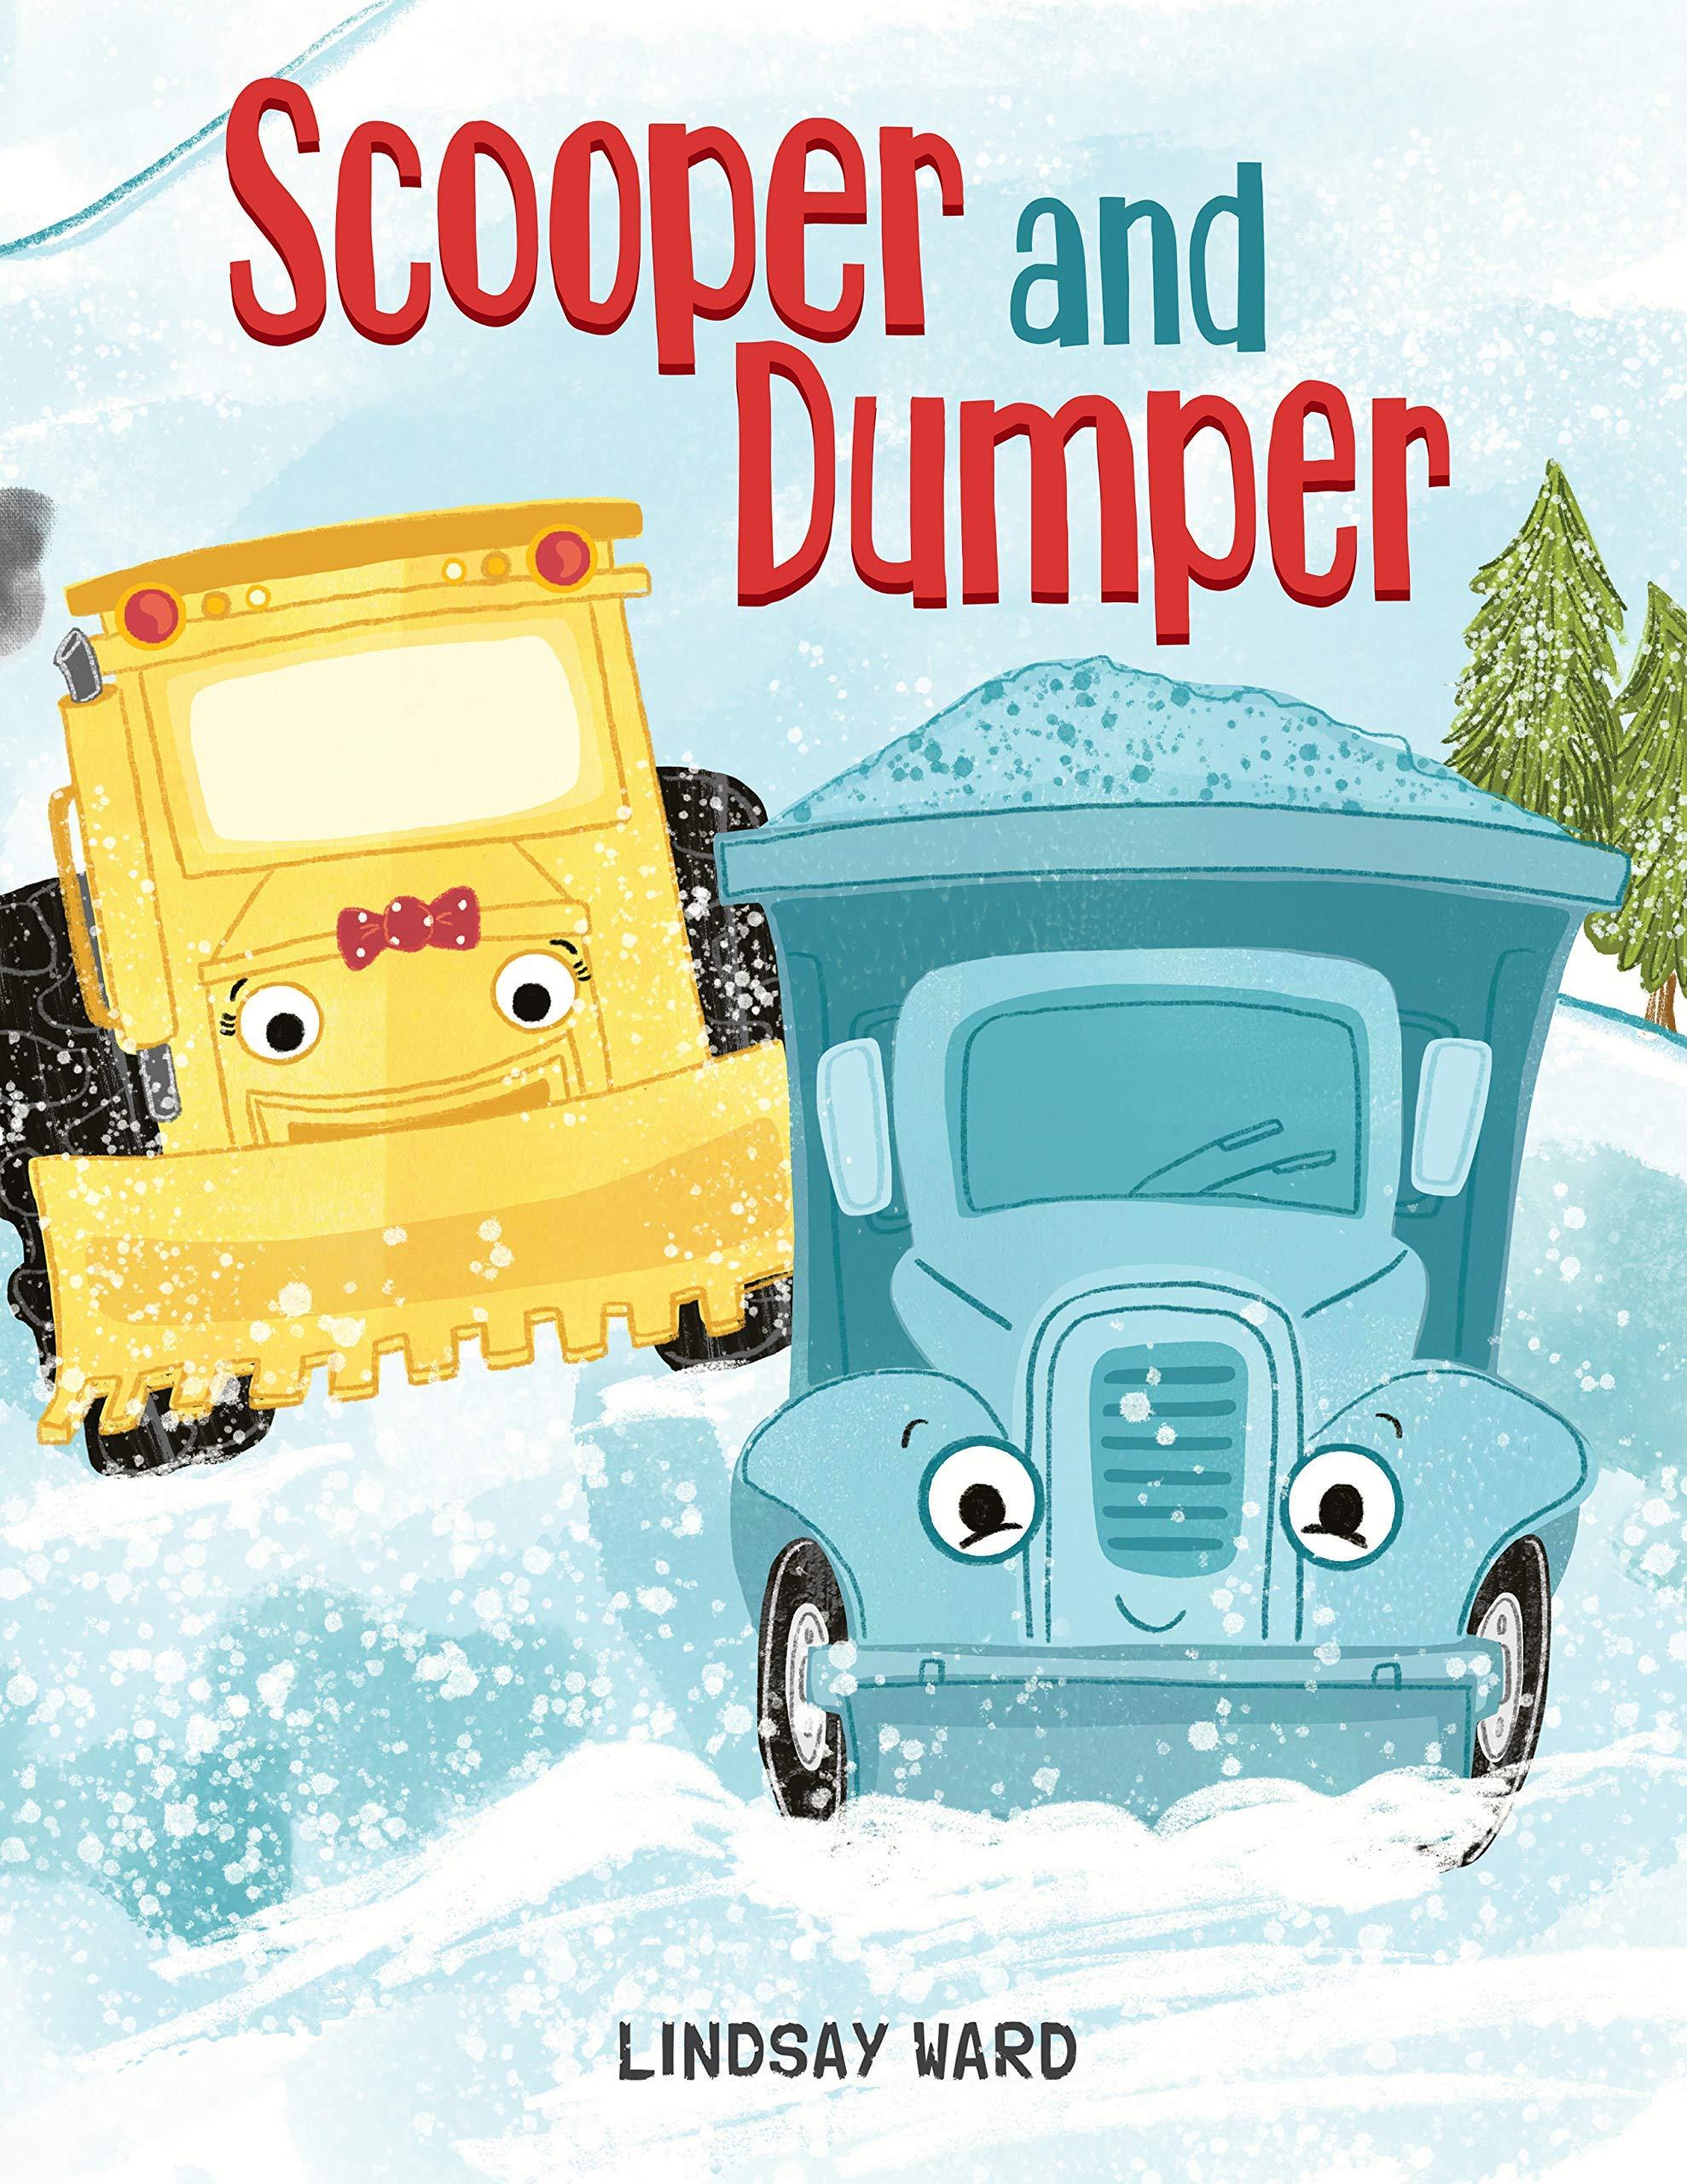 celebrate-picture-books-picture-book-review-scooper-and-dumper-cover